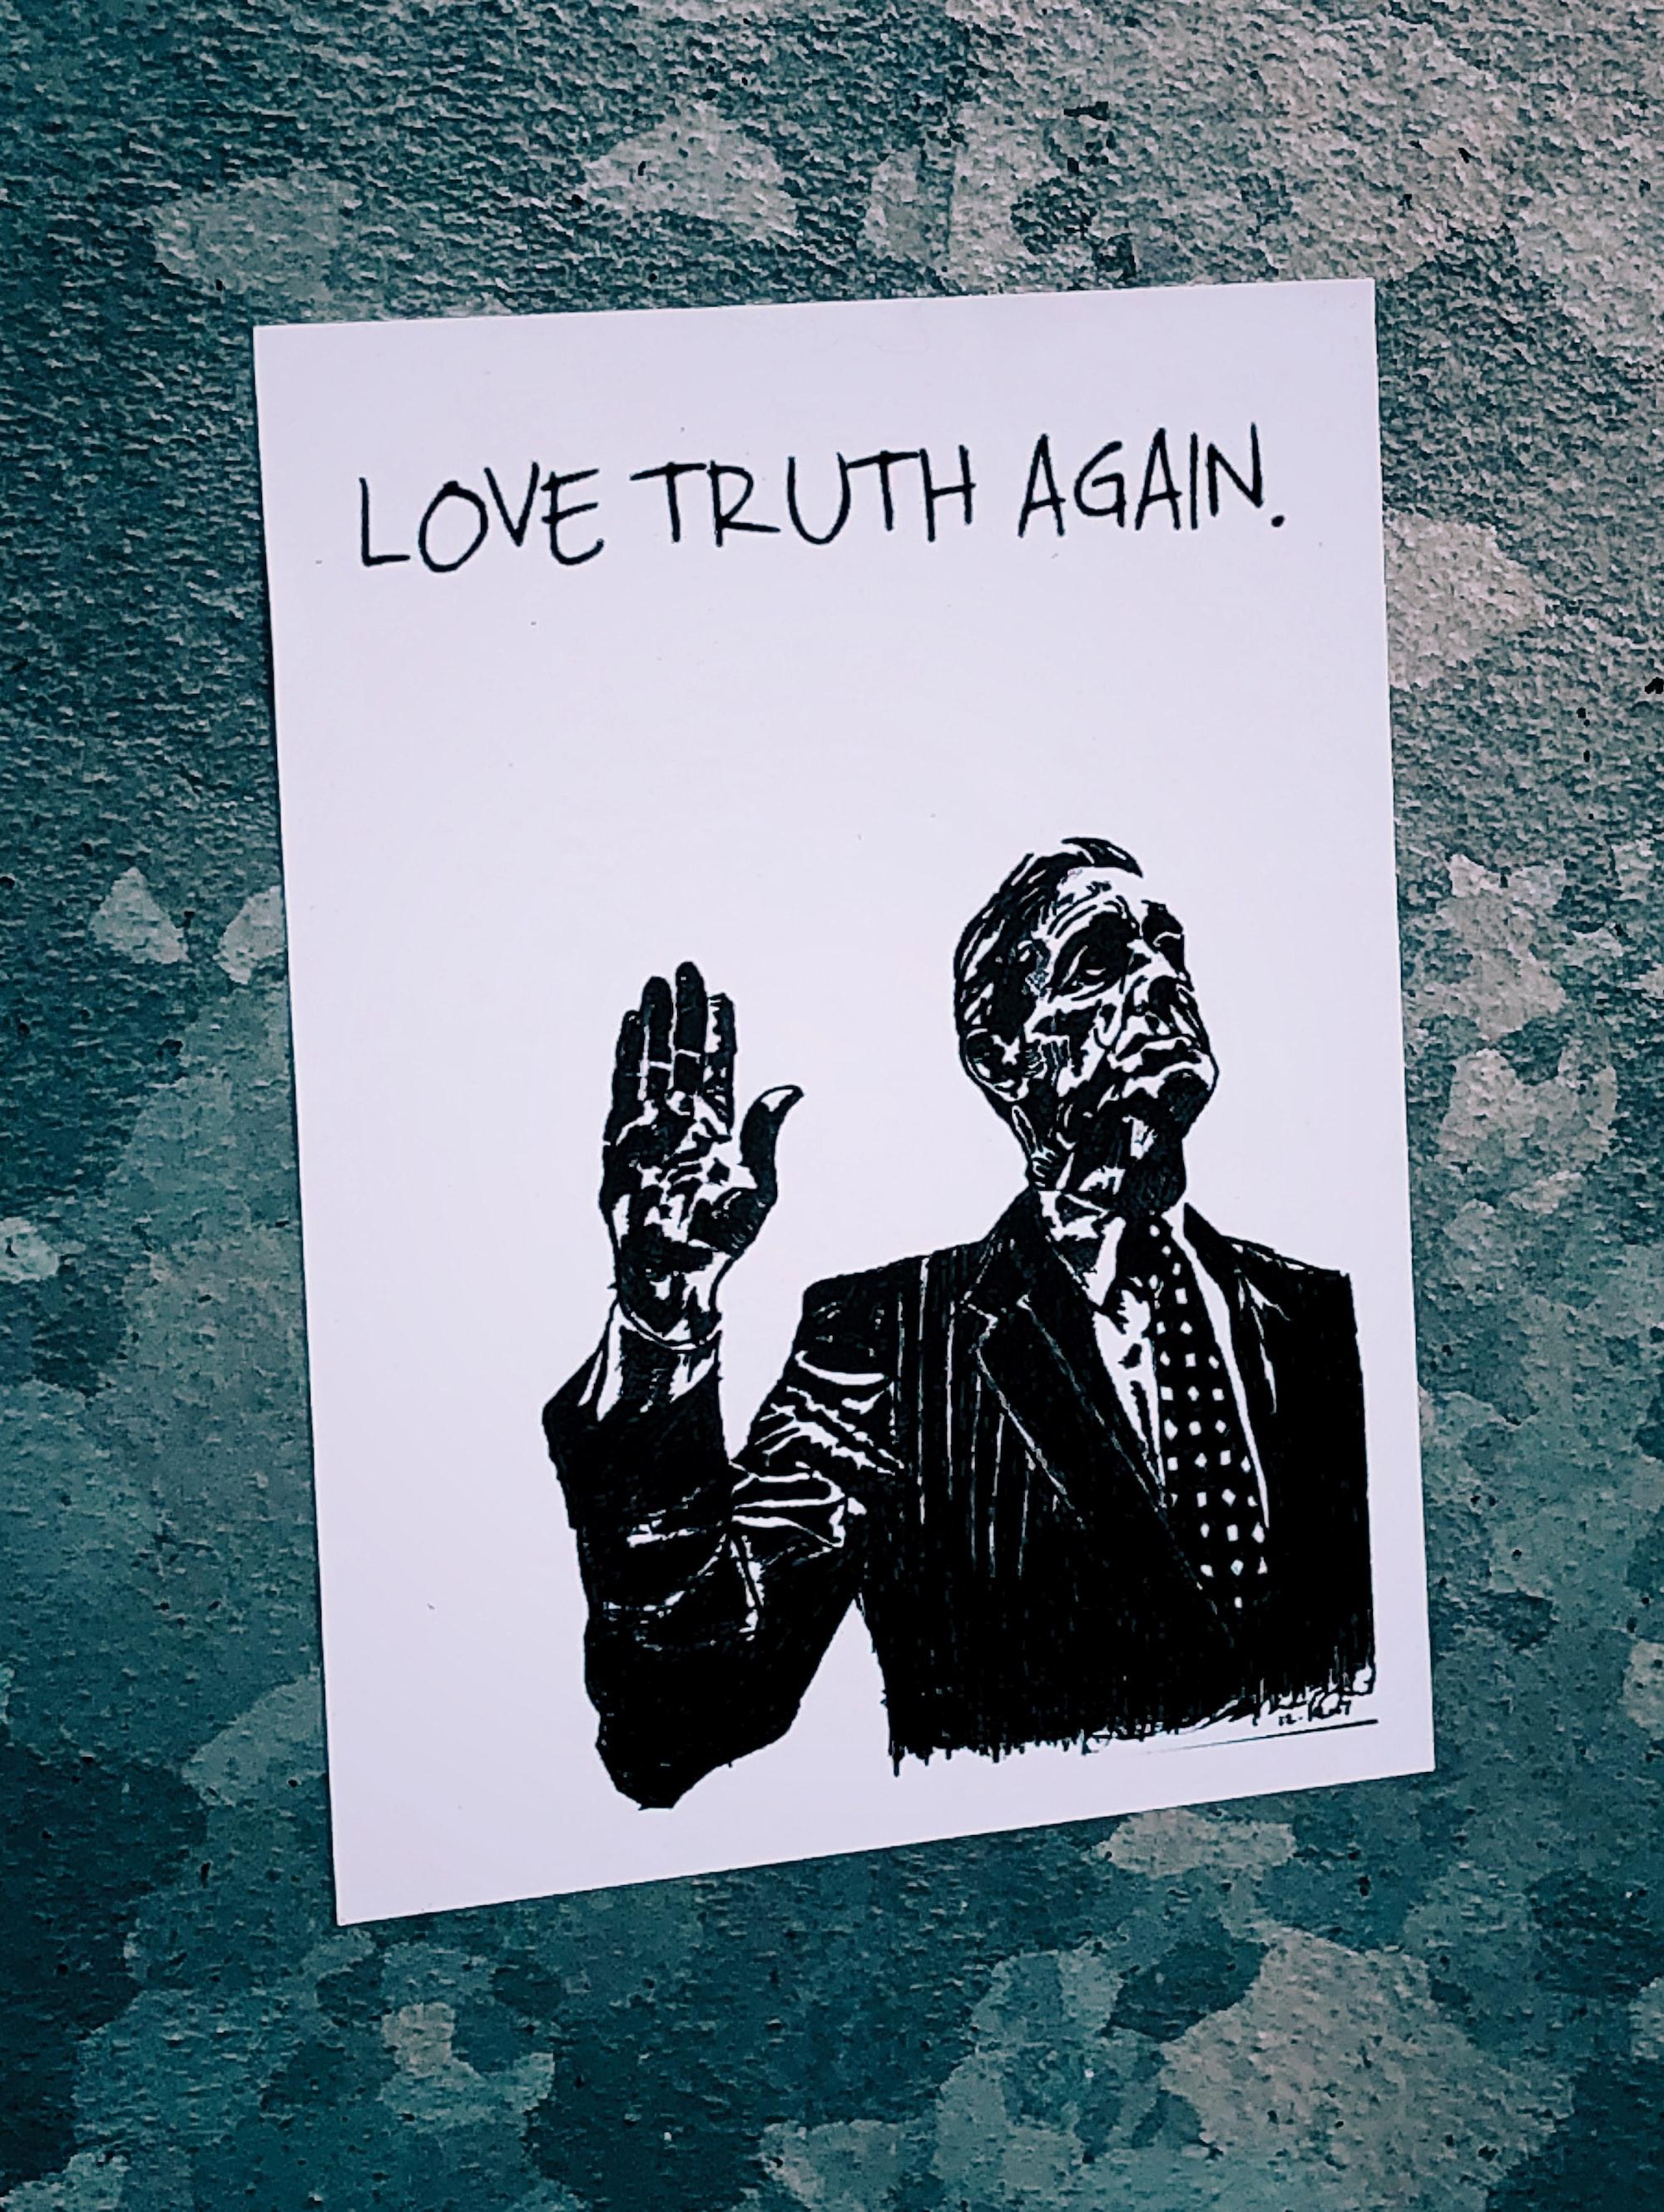 Some Inconvenient Truths